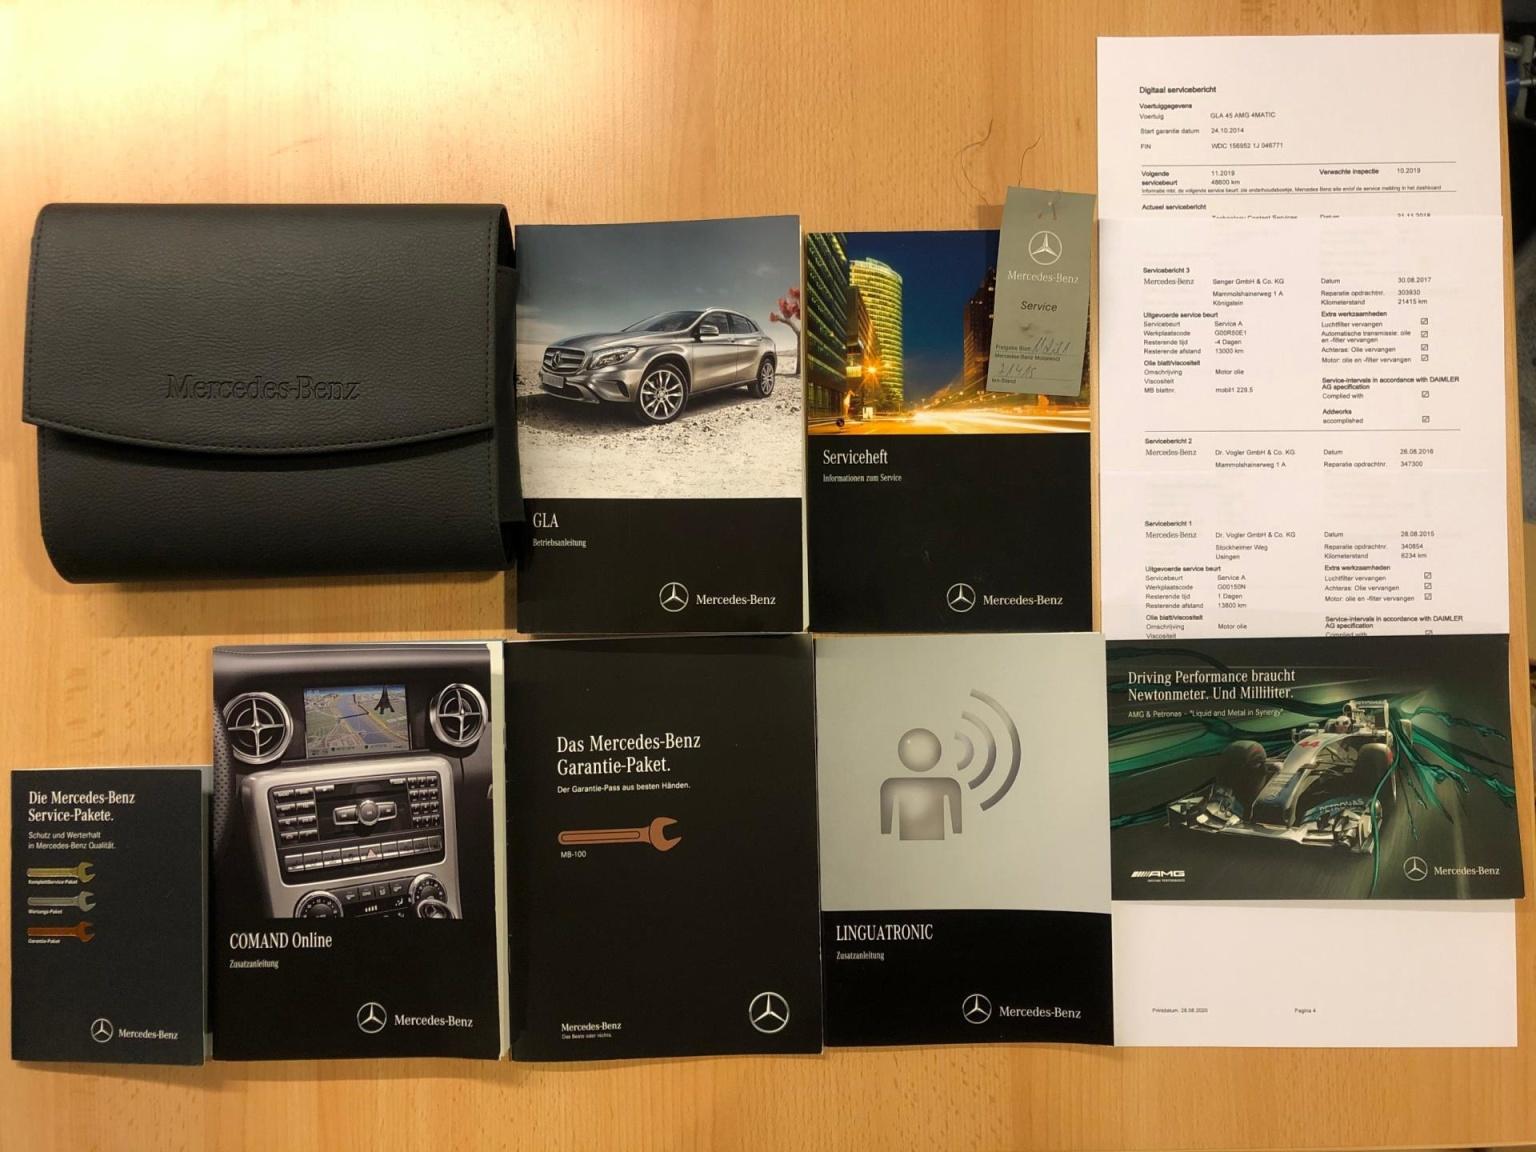 Mercedes-Benz-GLA-35